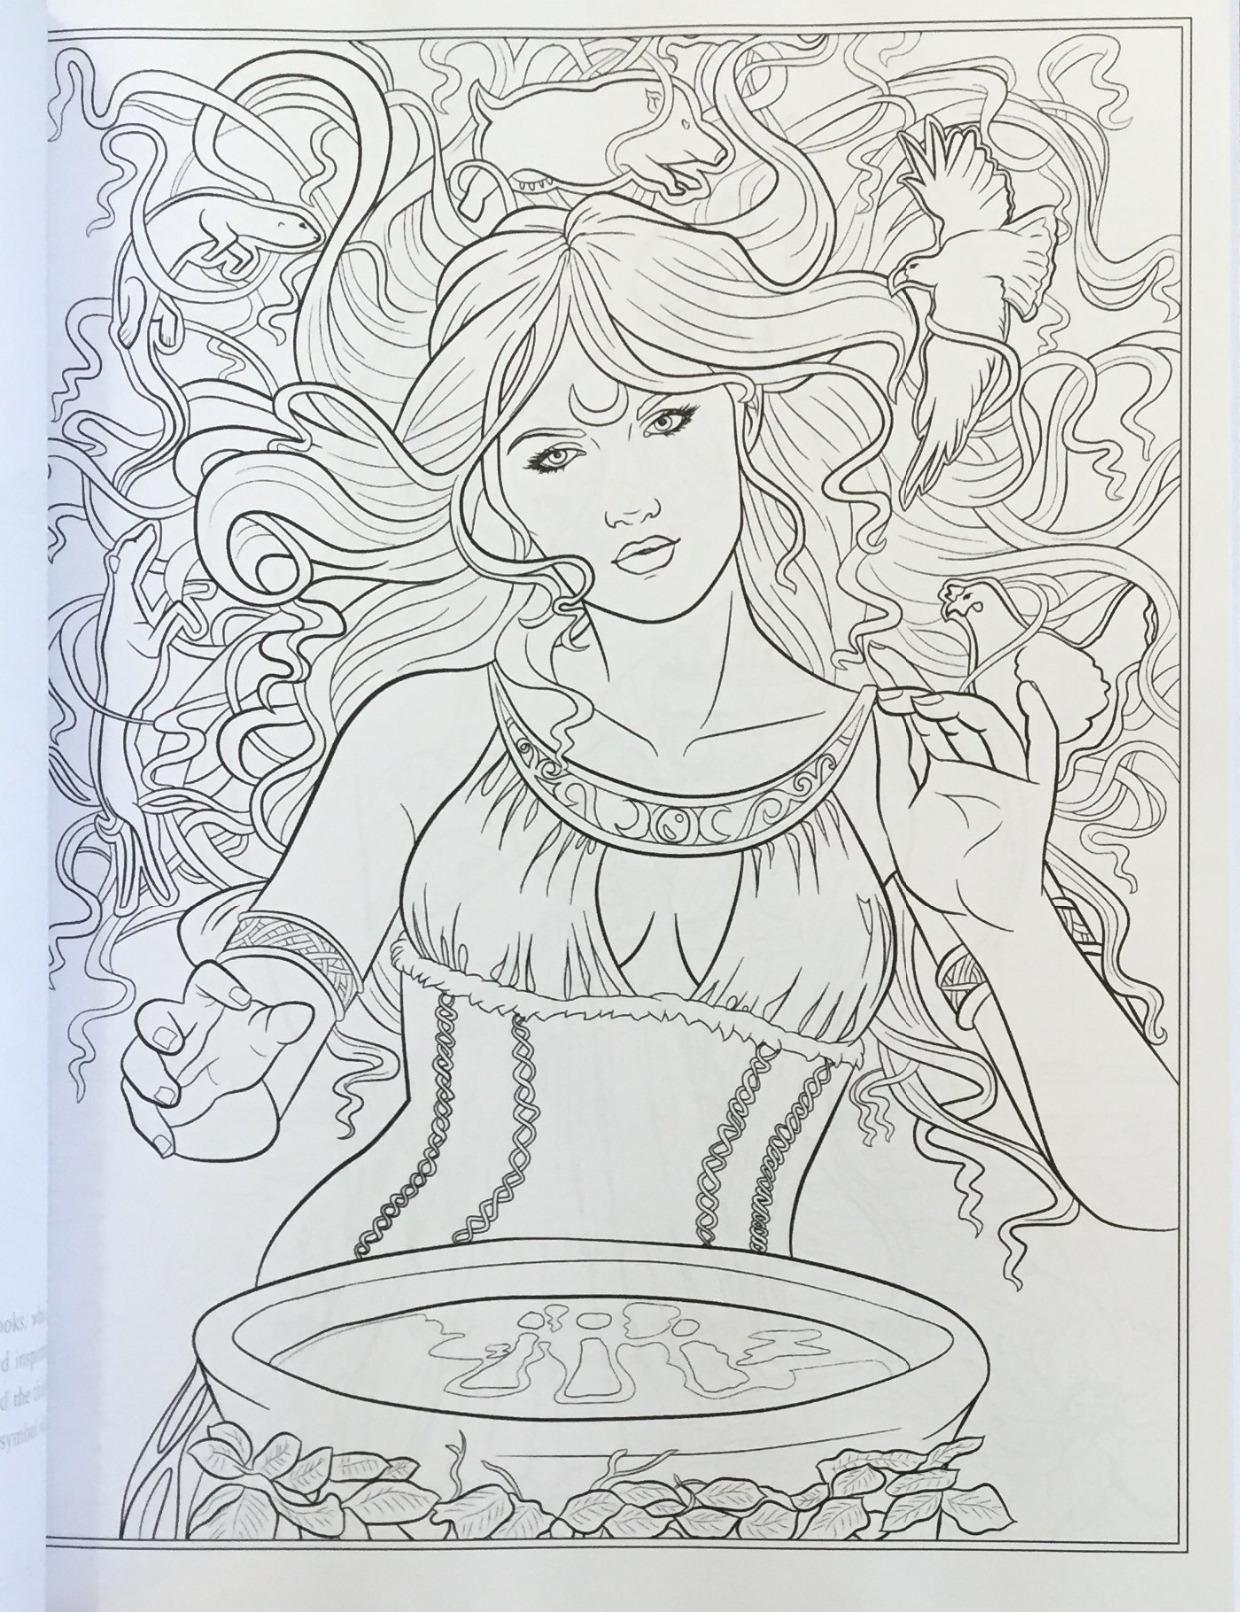 Amazon.com: Goddess and Mythology Coloring Book (Fantasy Coloring by ...